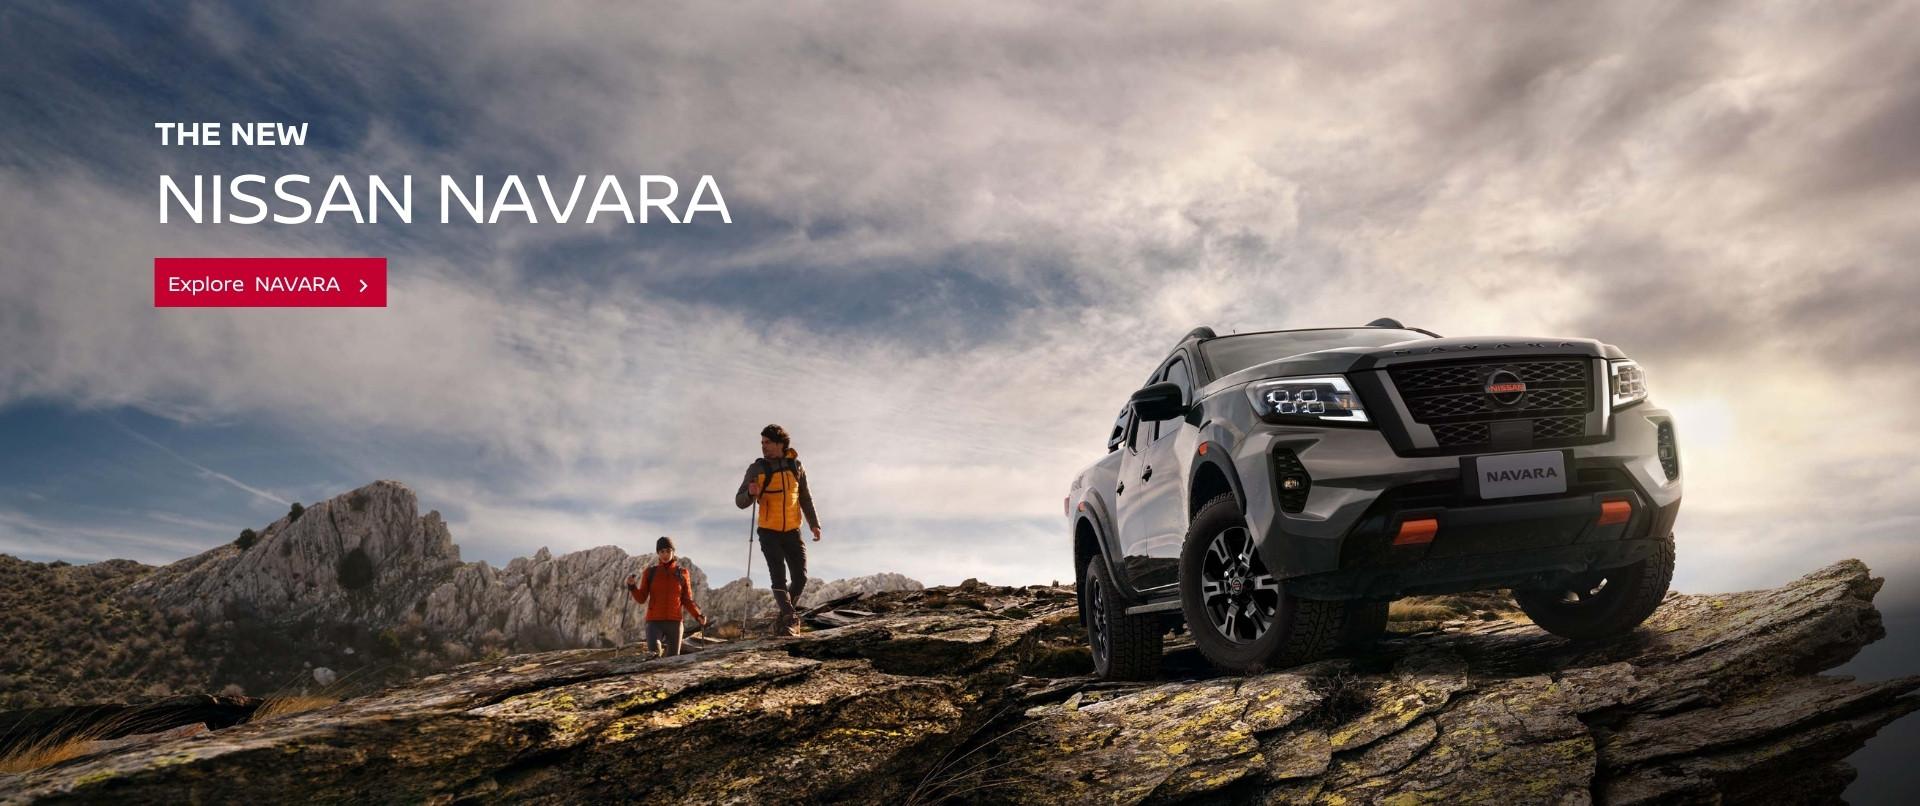 Tough. Rugged. Advanced. The new Nissan Navara